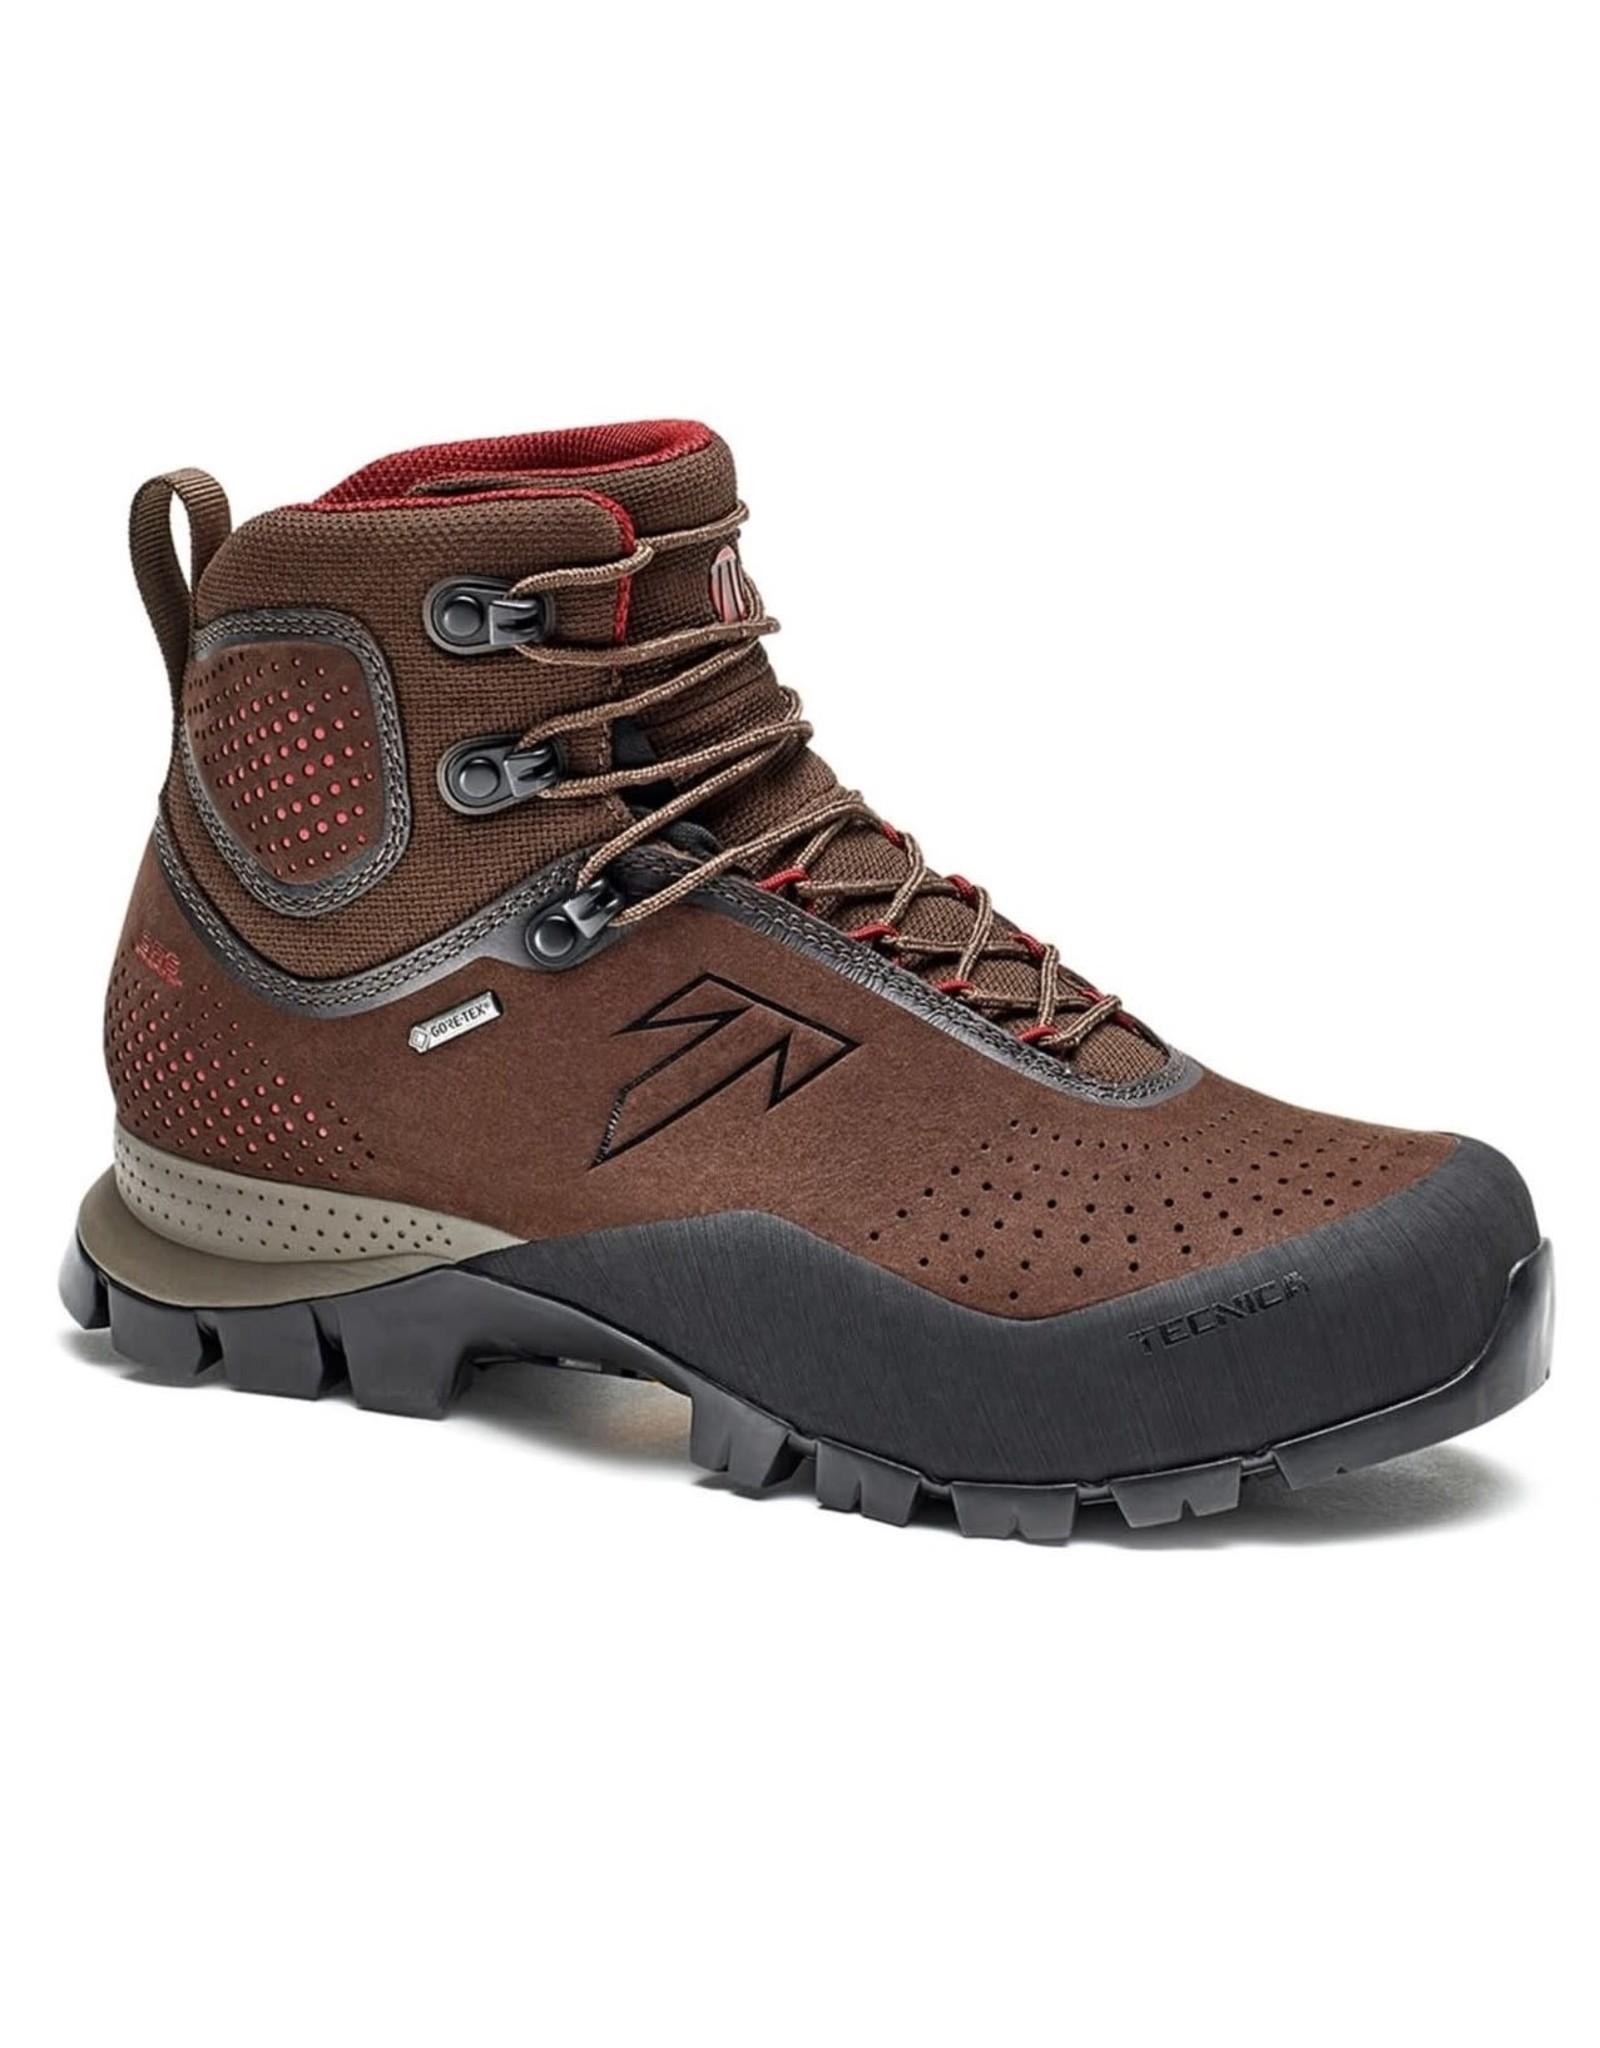 Tecnica Tecnica Forge GTX  Boots - Women